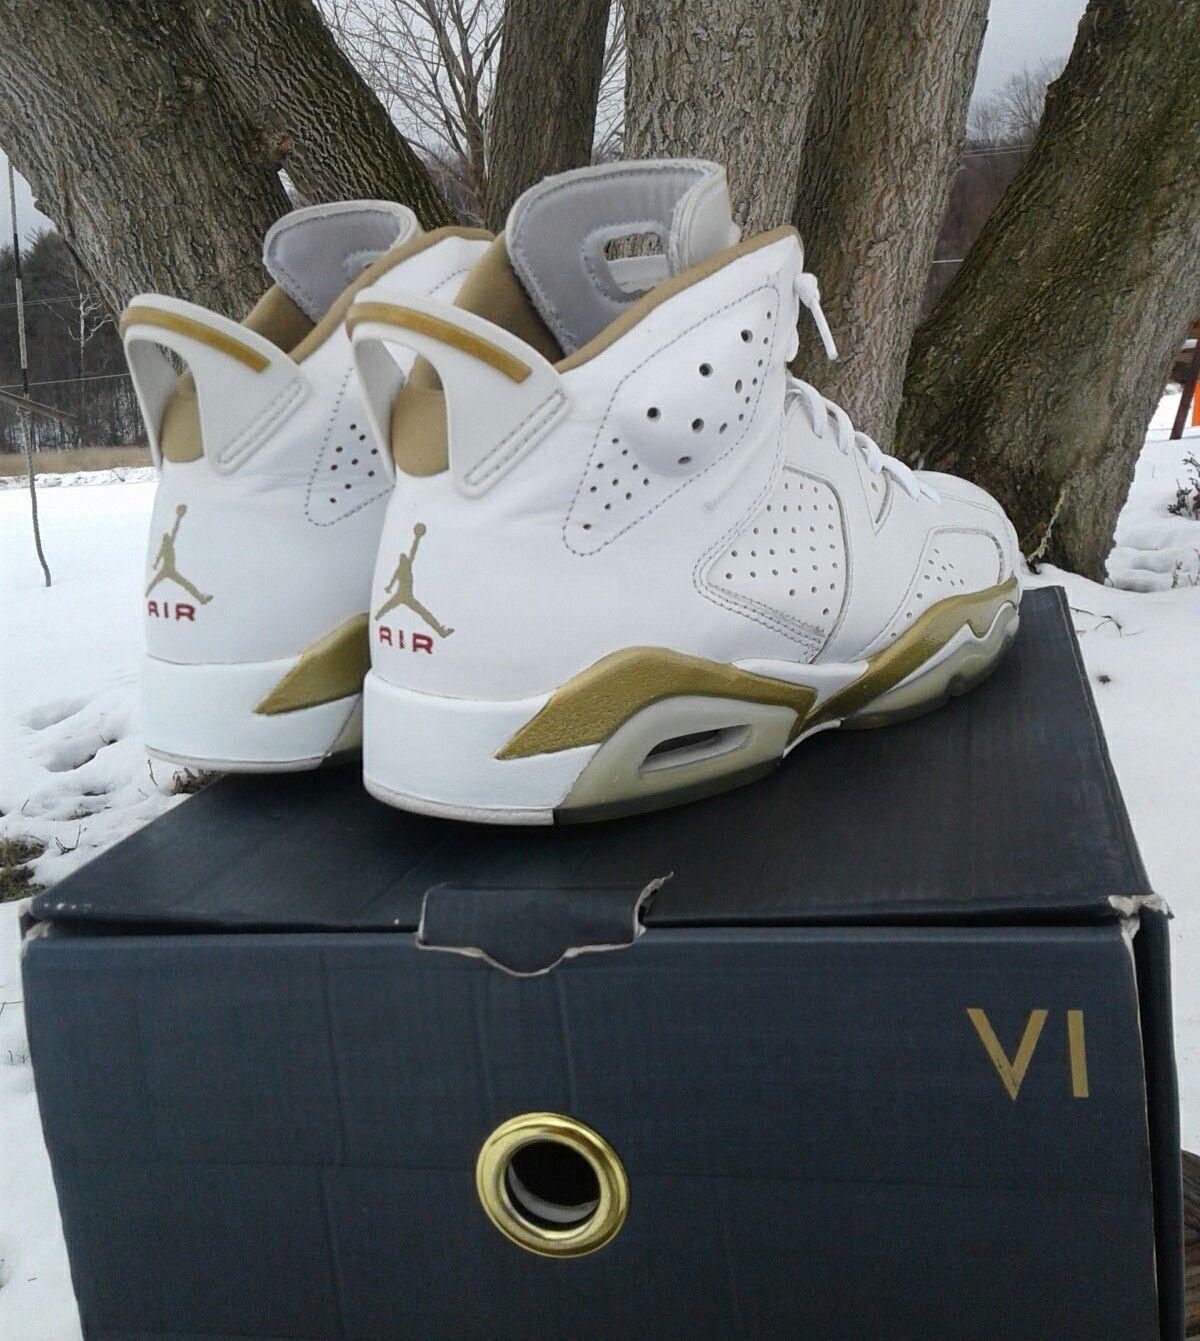 brand new 75e7b c7181 Nike Air Jordan GMP VI 6 Retro GOLDEN MOMENTS 9.5   eBay